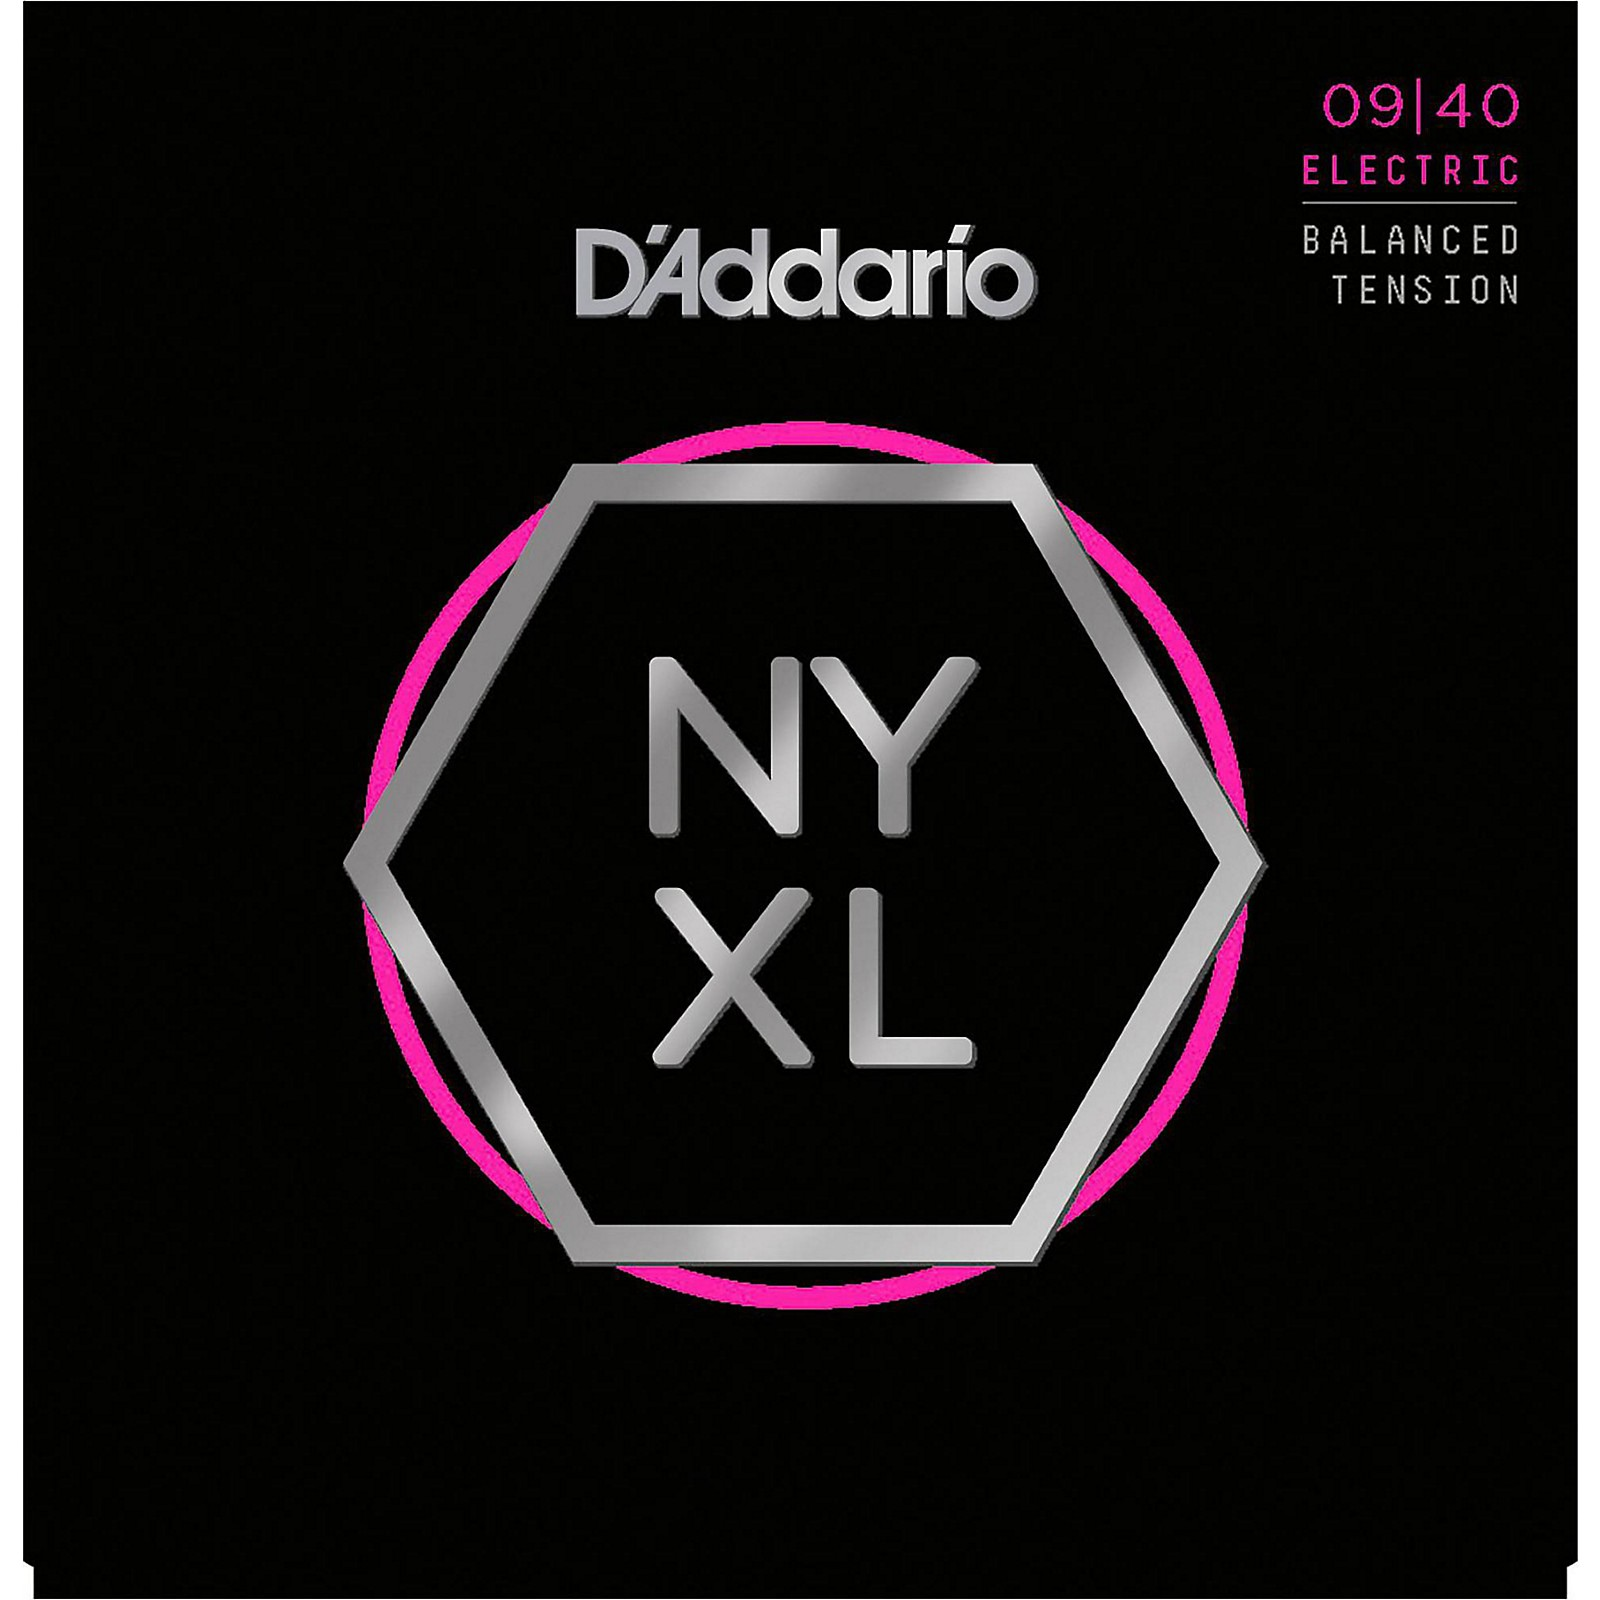 D'Addario NYXL0940BT Super Light Balanced Tension Electric Guitar Strings